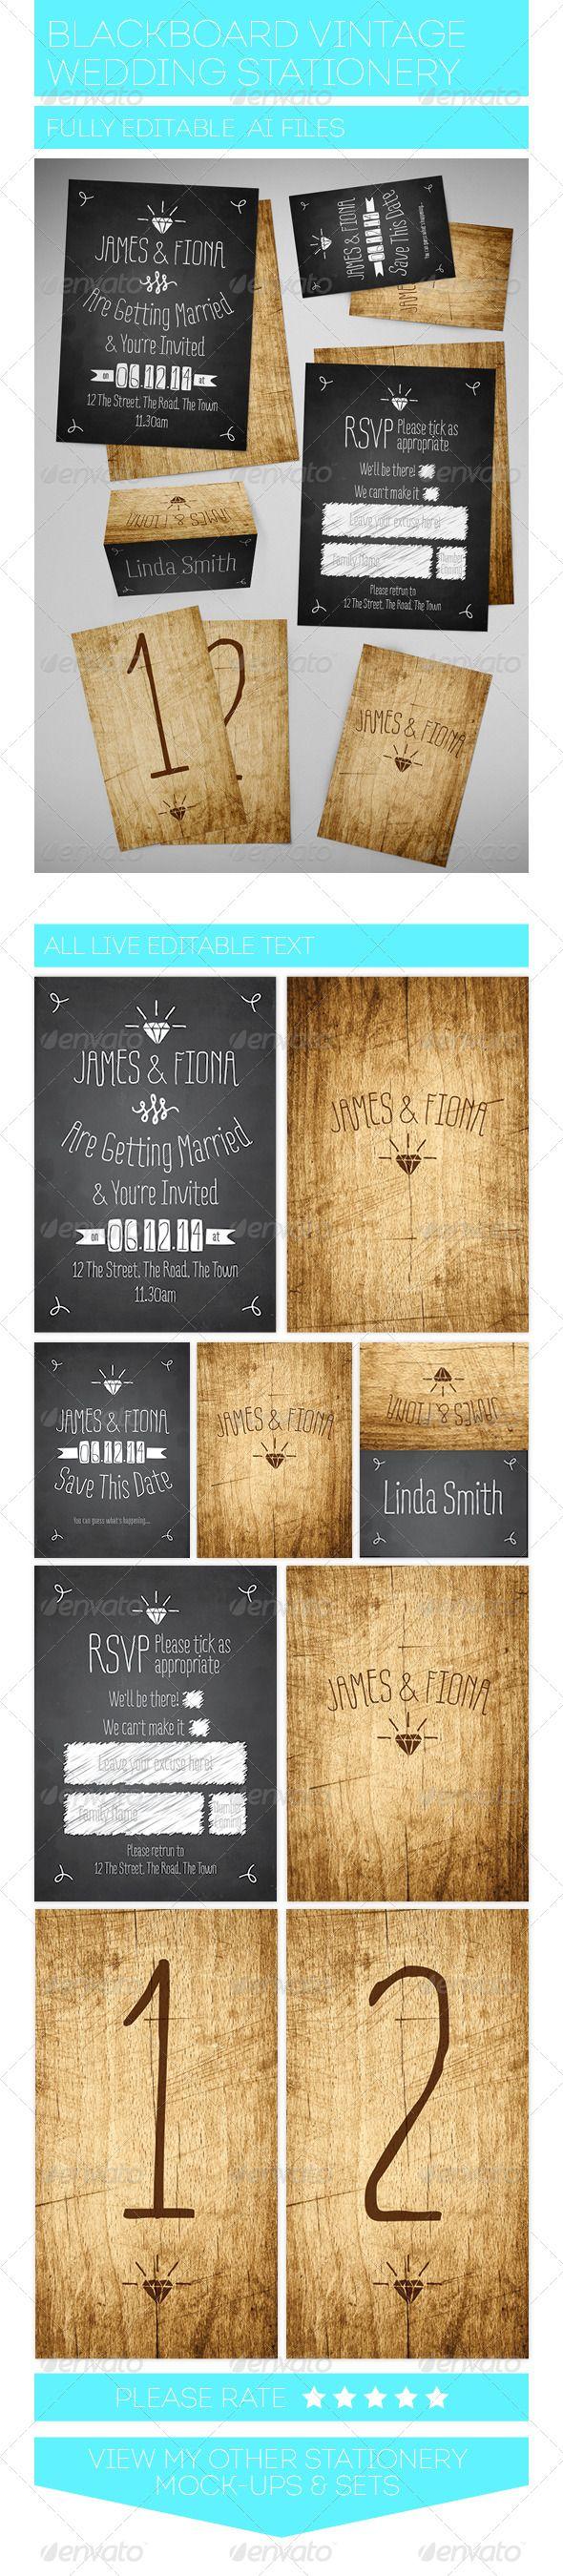 Blackboard Vintage Wedding Stationery Set